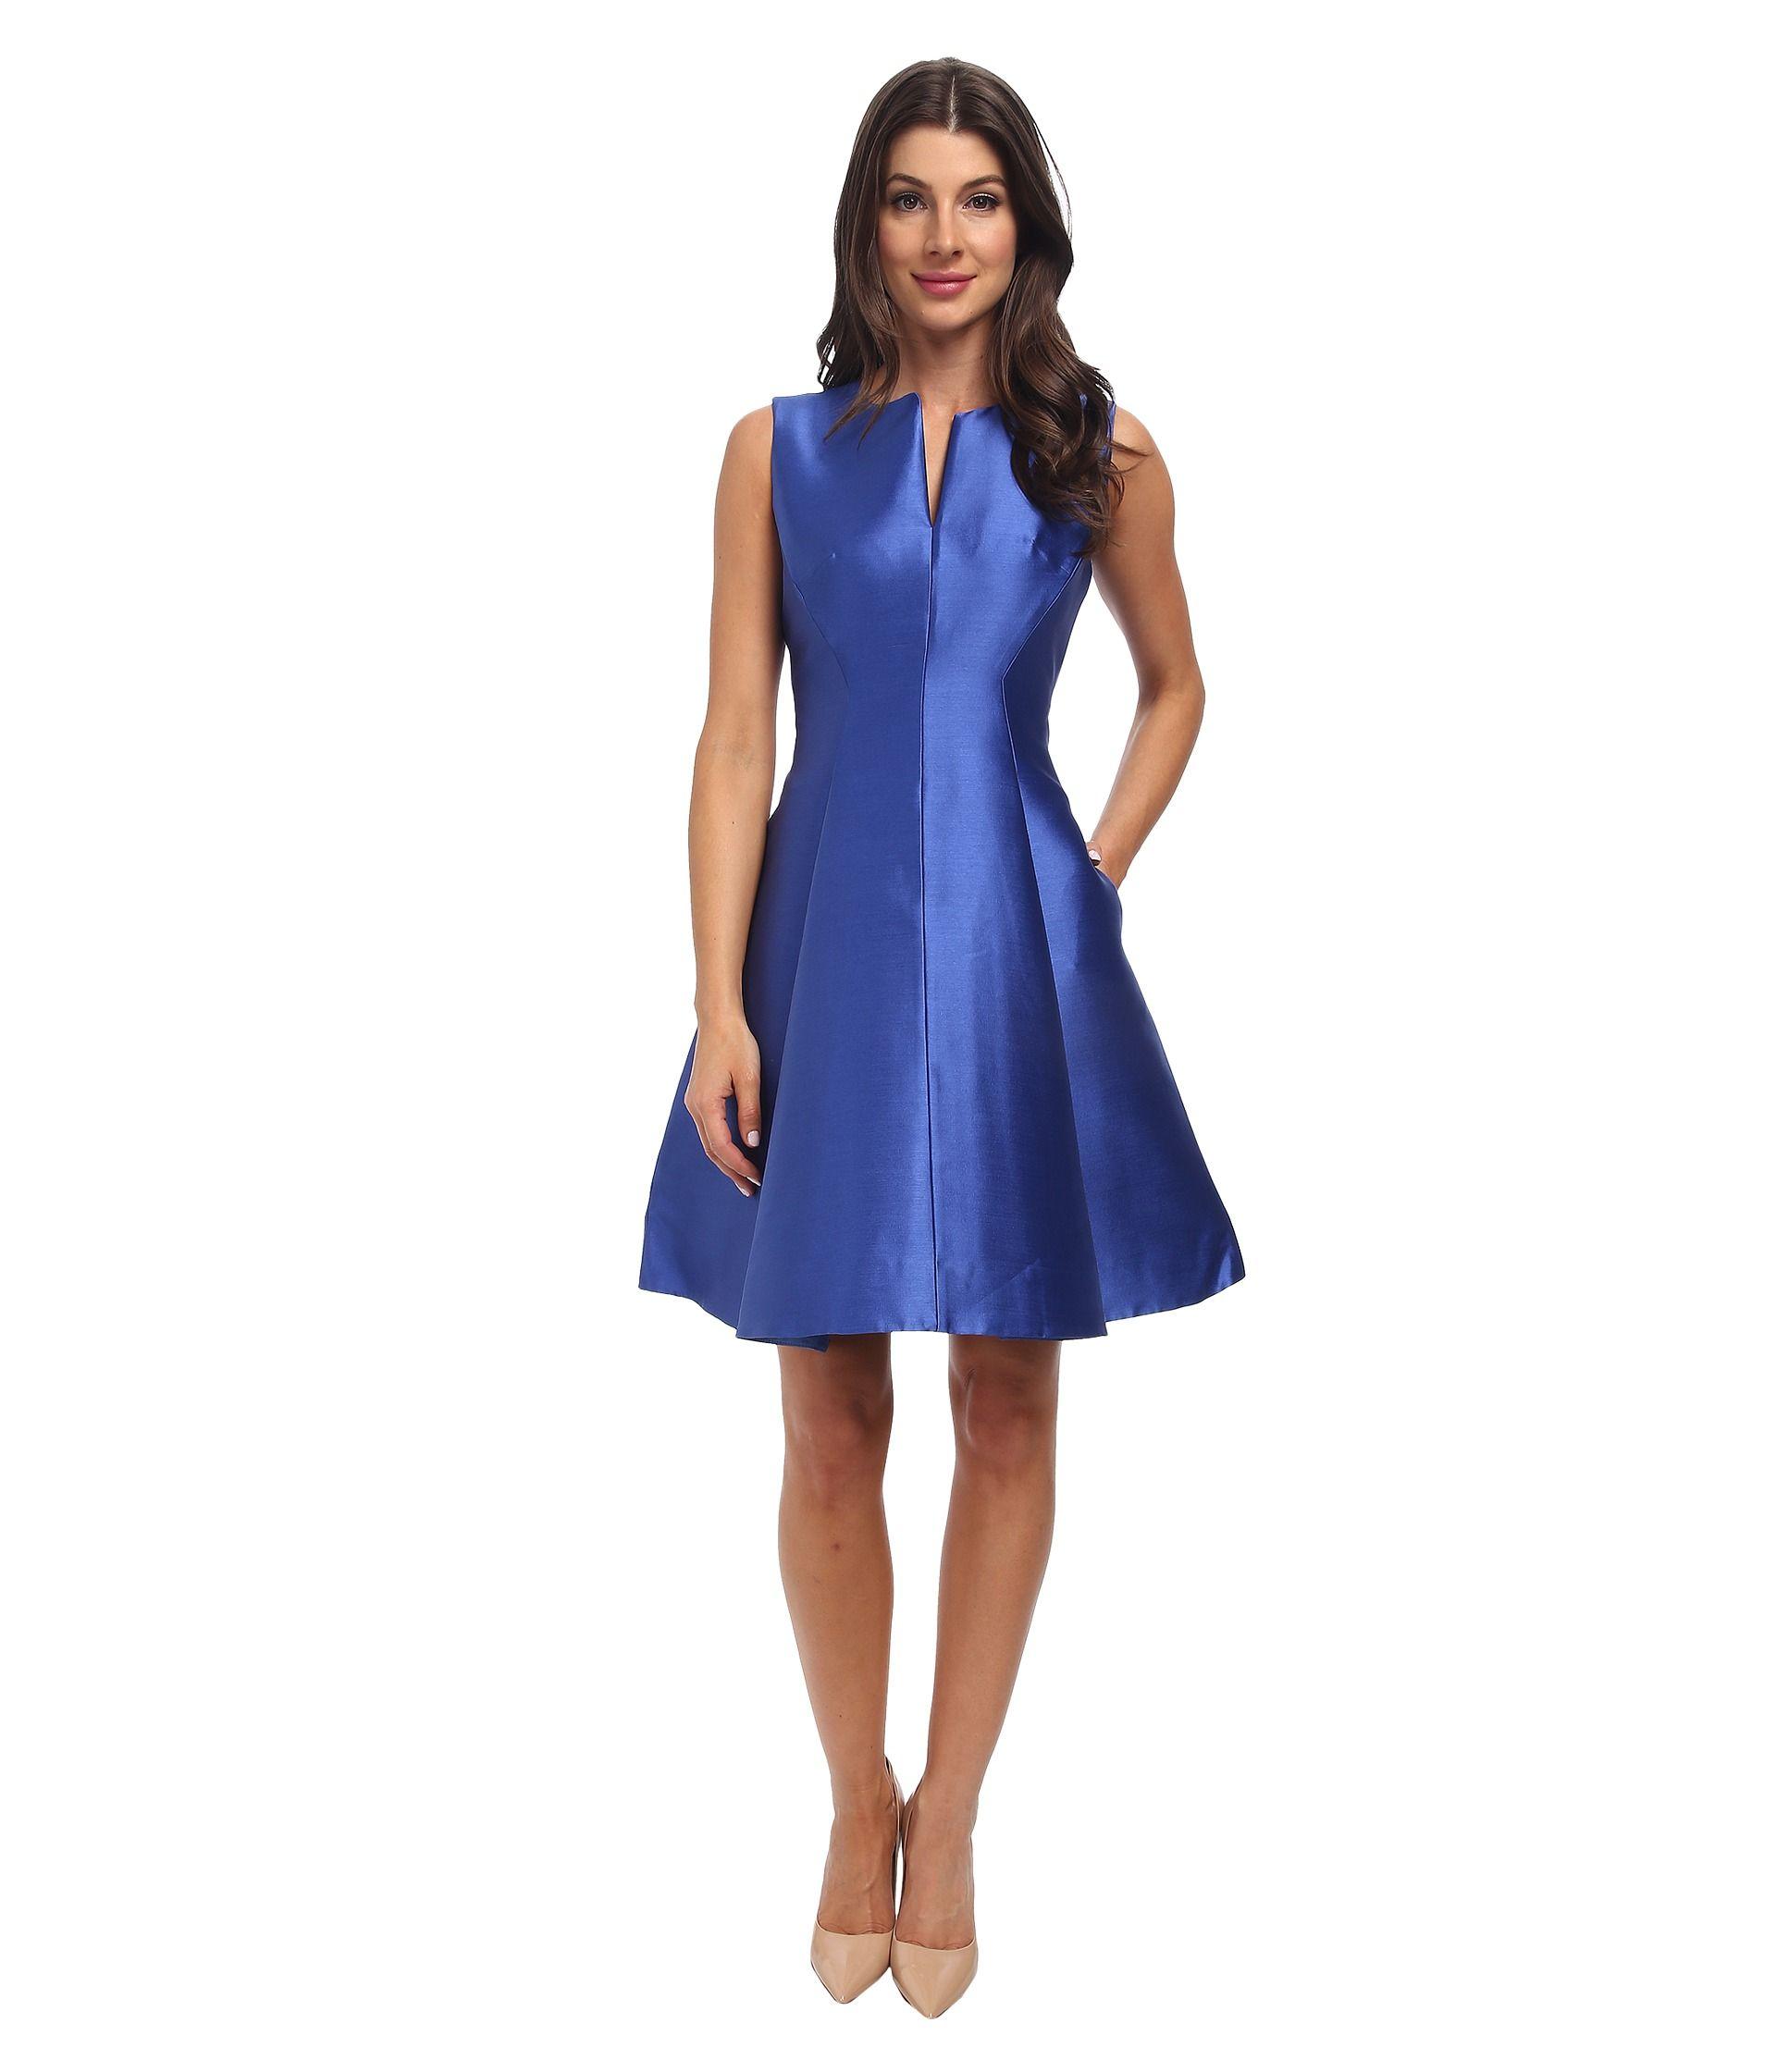 Kate Spade New York Charleen Dress Dresses Fashion Mid Dresses [ 2240 x 1920 Pixel ]